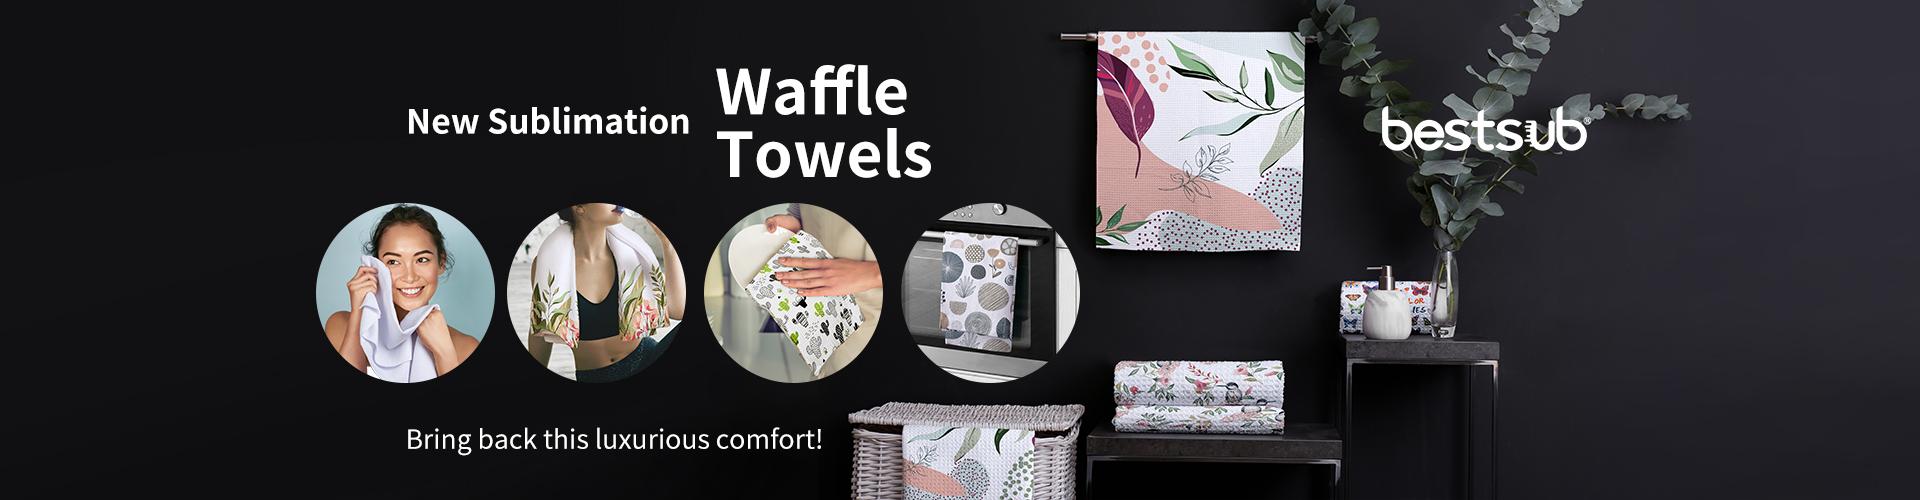 2021-04-30_New_Sublimation_Waffle_Towels_new_web